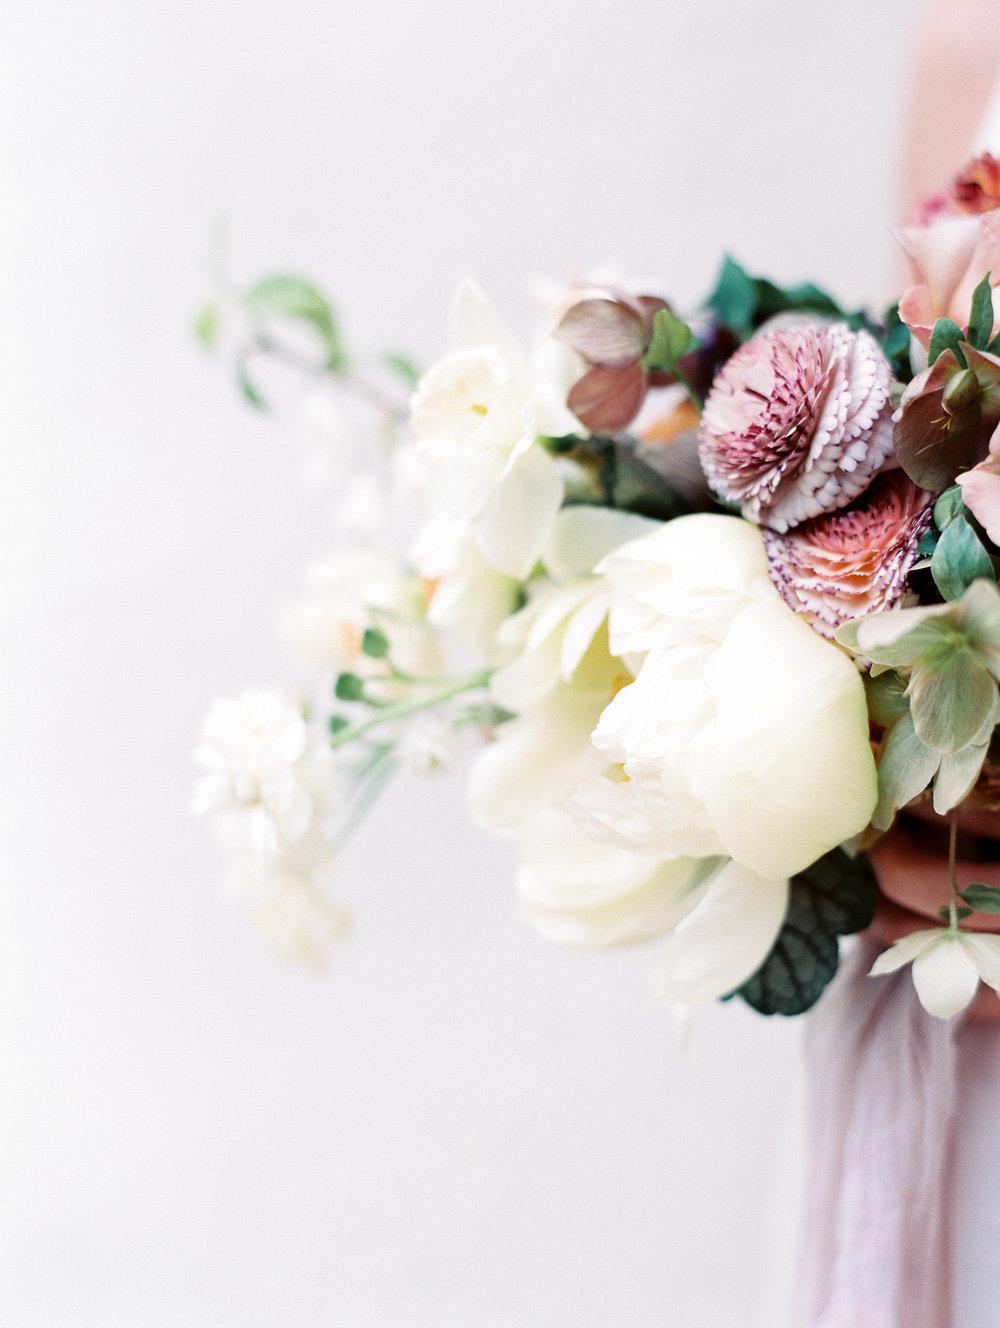 A Floral Designer's Process -